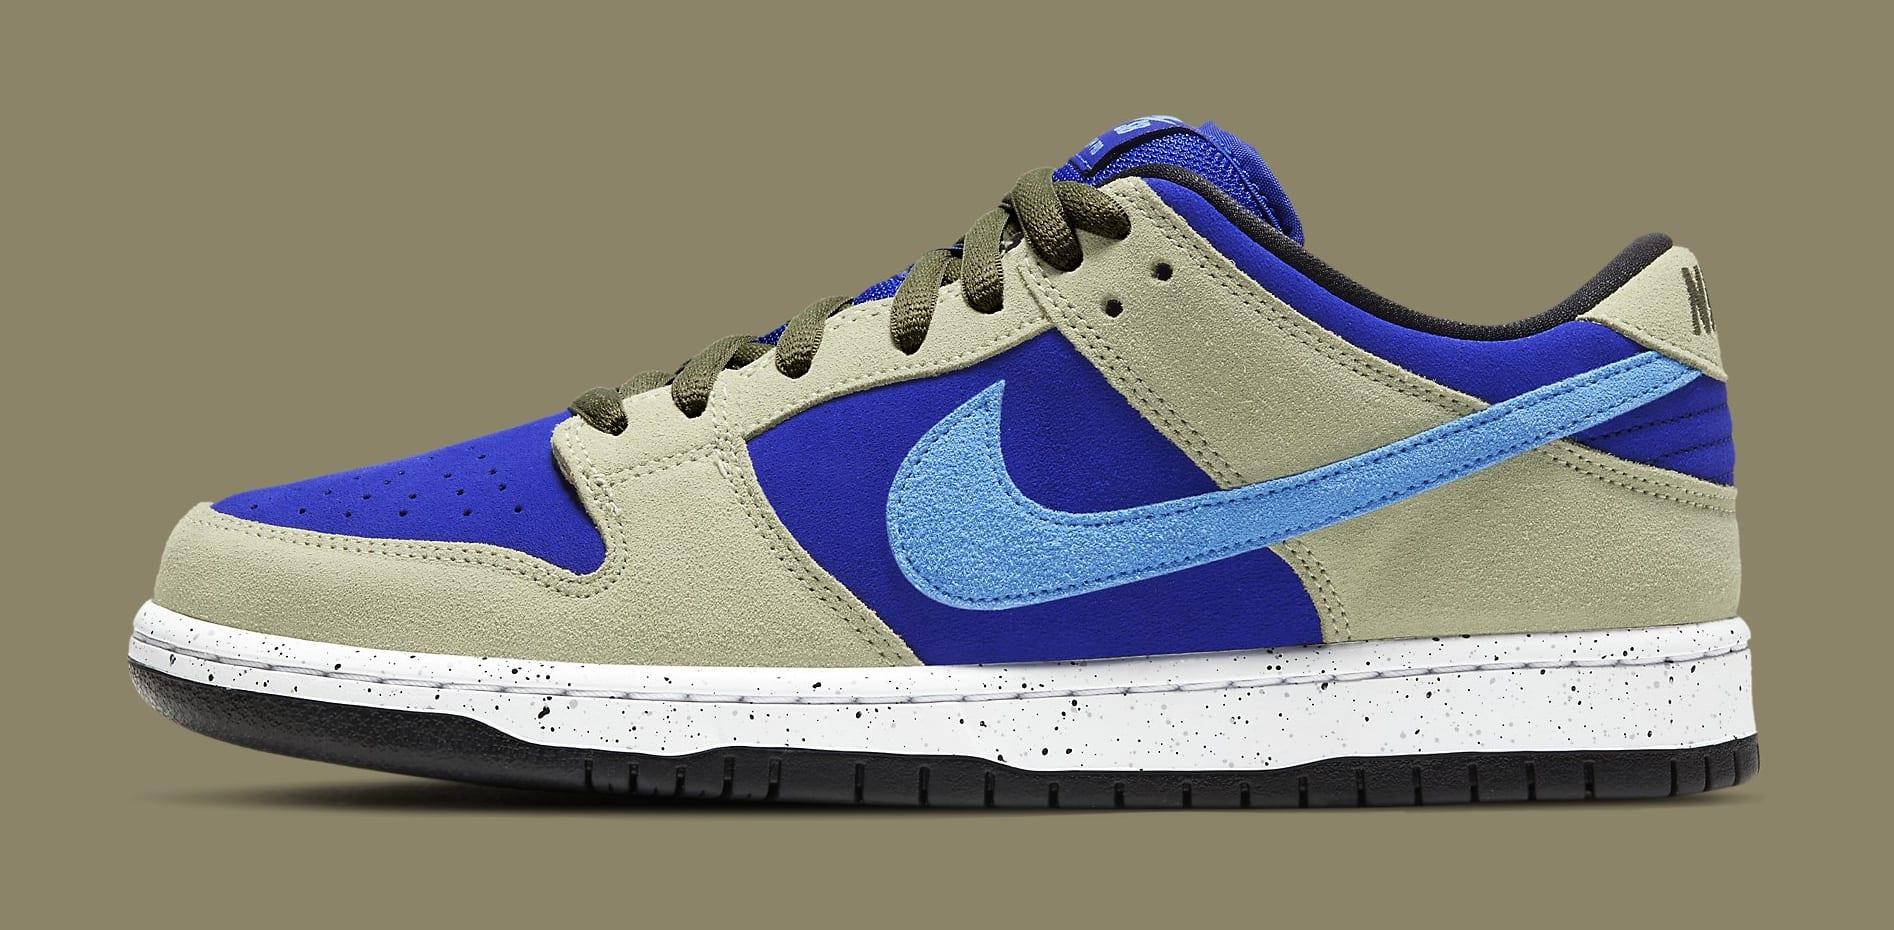 Nike SB Dunk Low 'ACG Caldera' BQ6817-301 Lateral